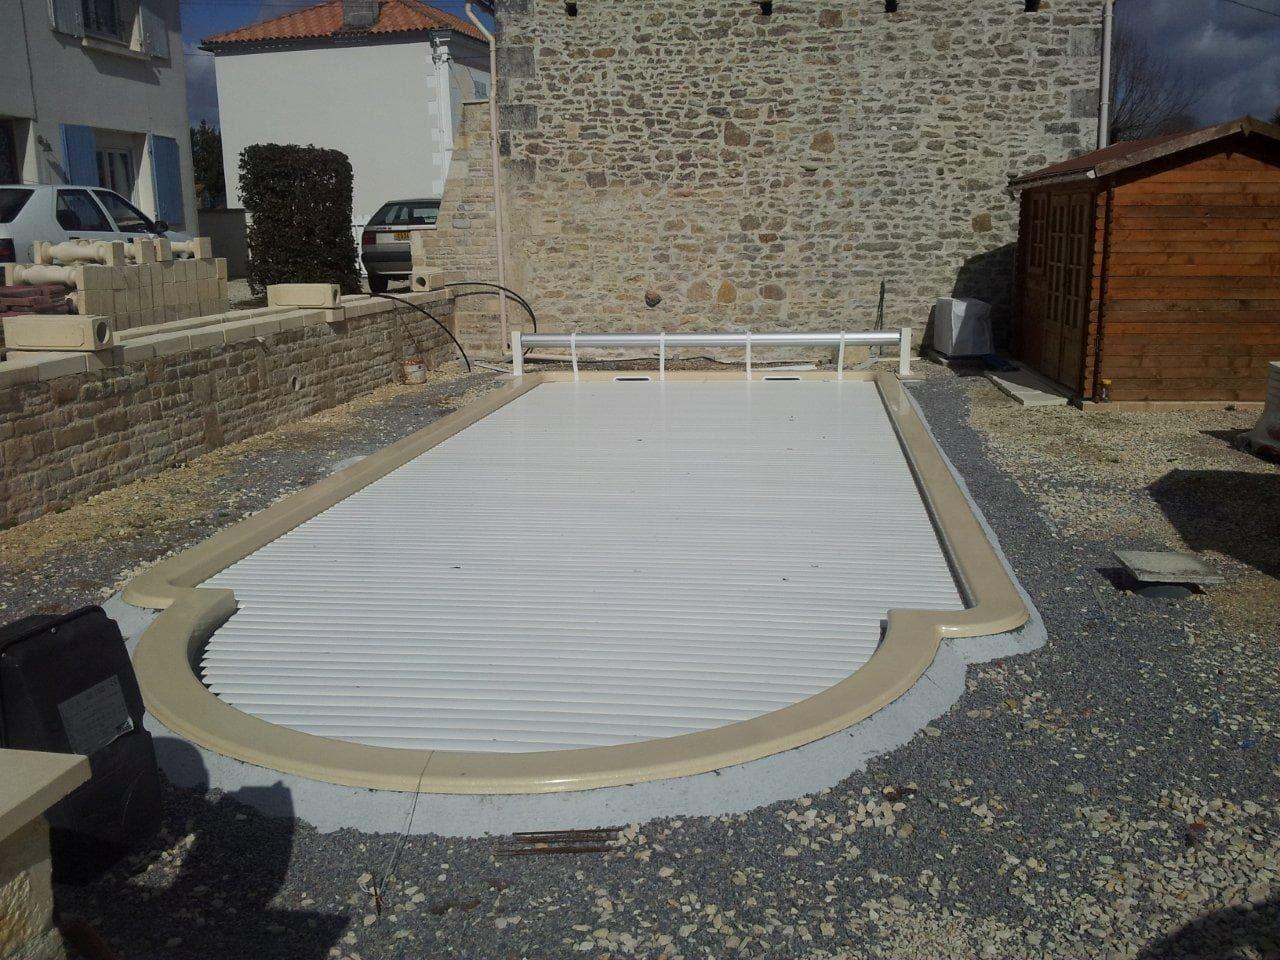 installalation de la piscine 9m50